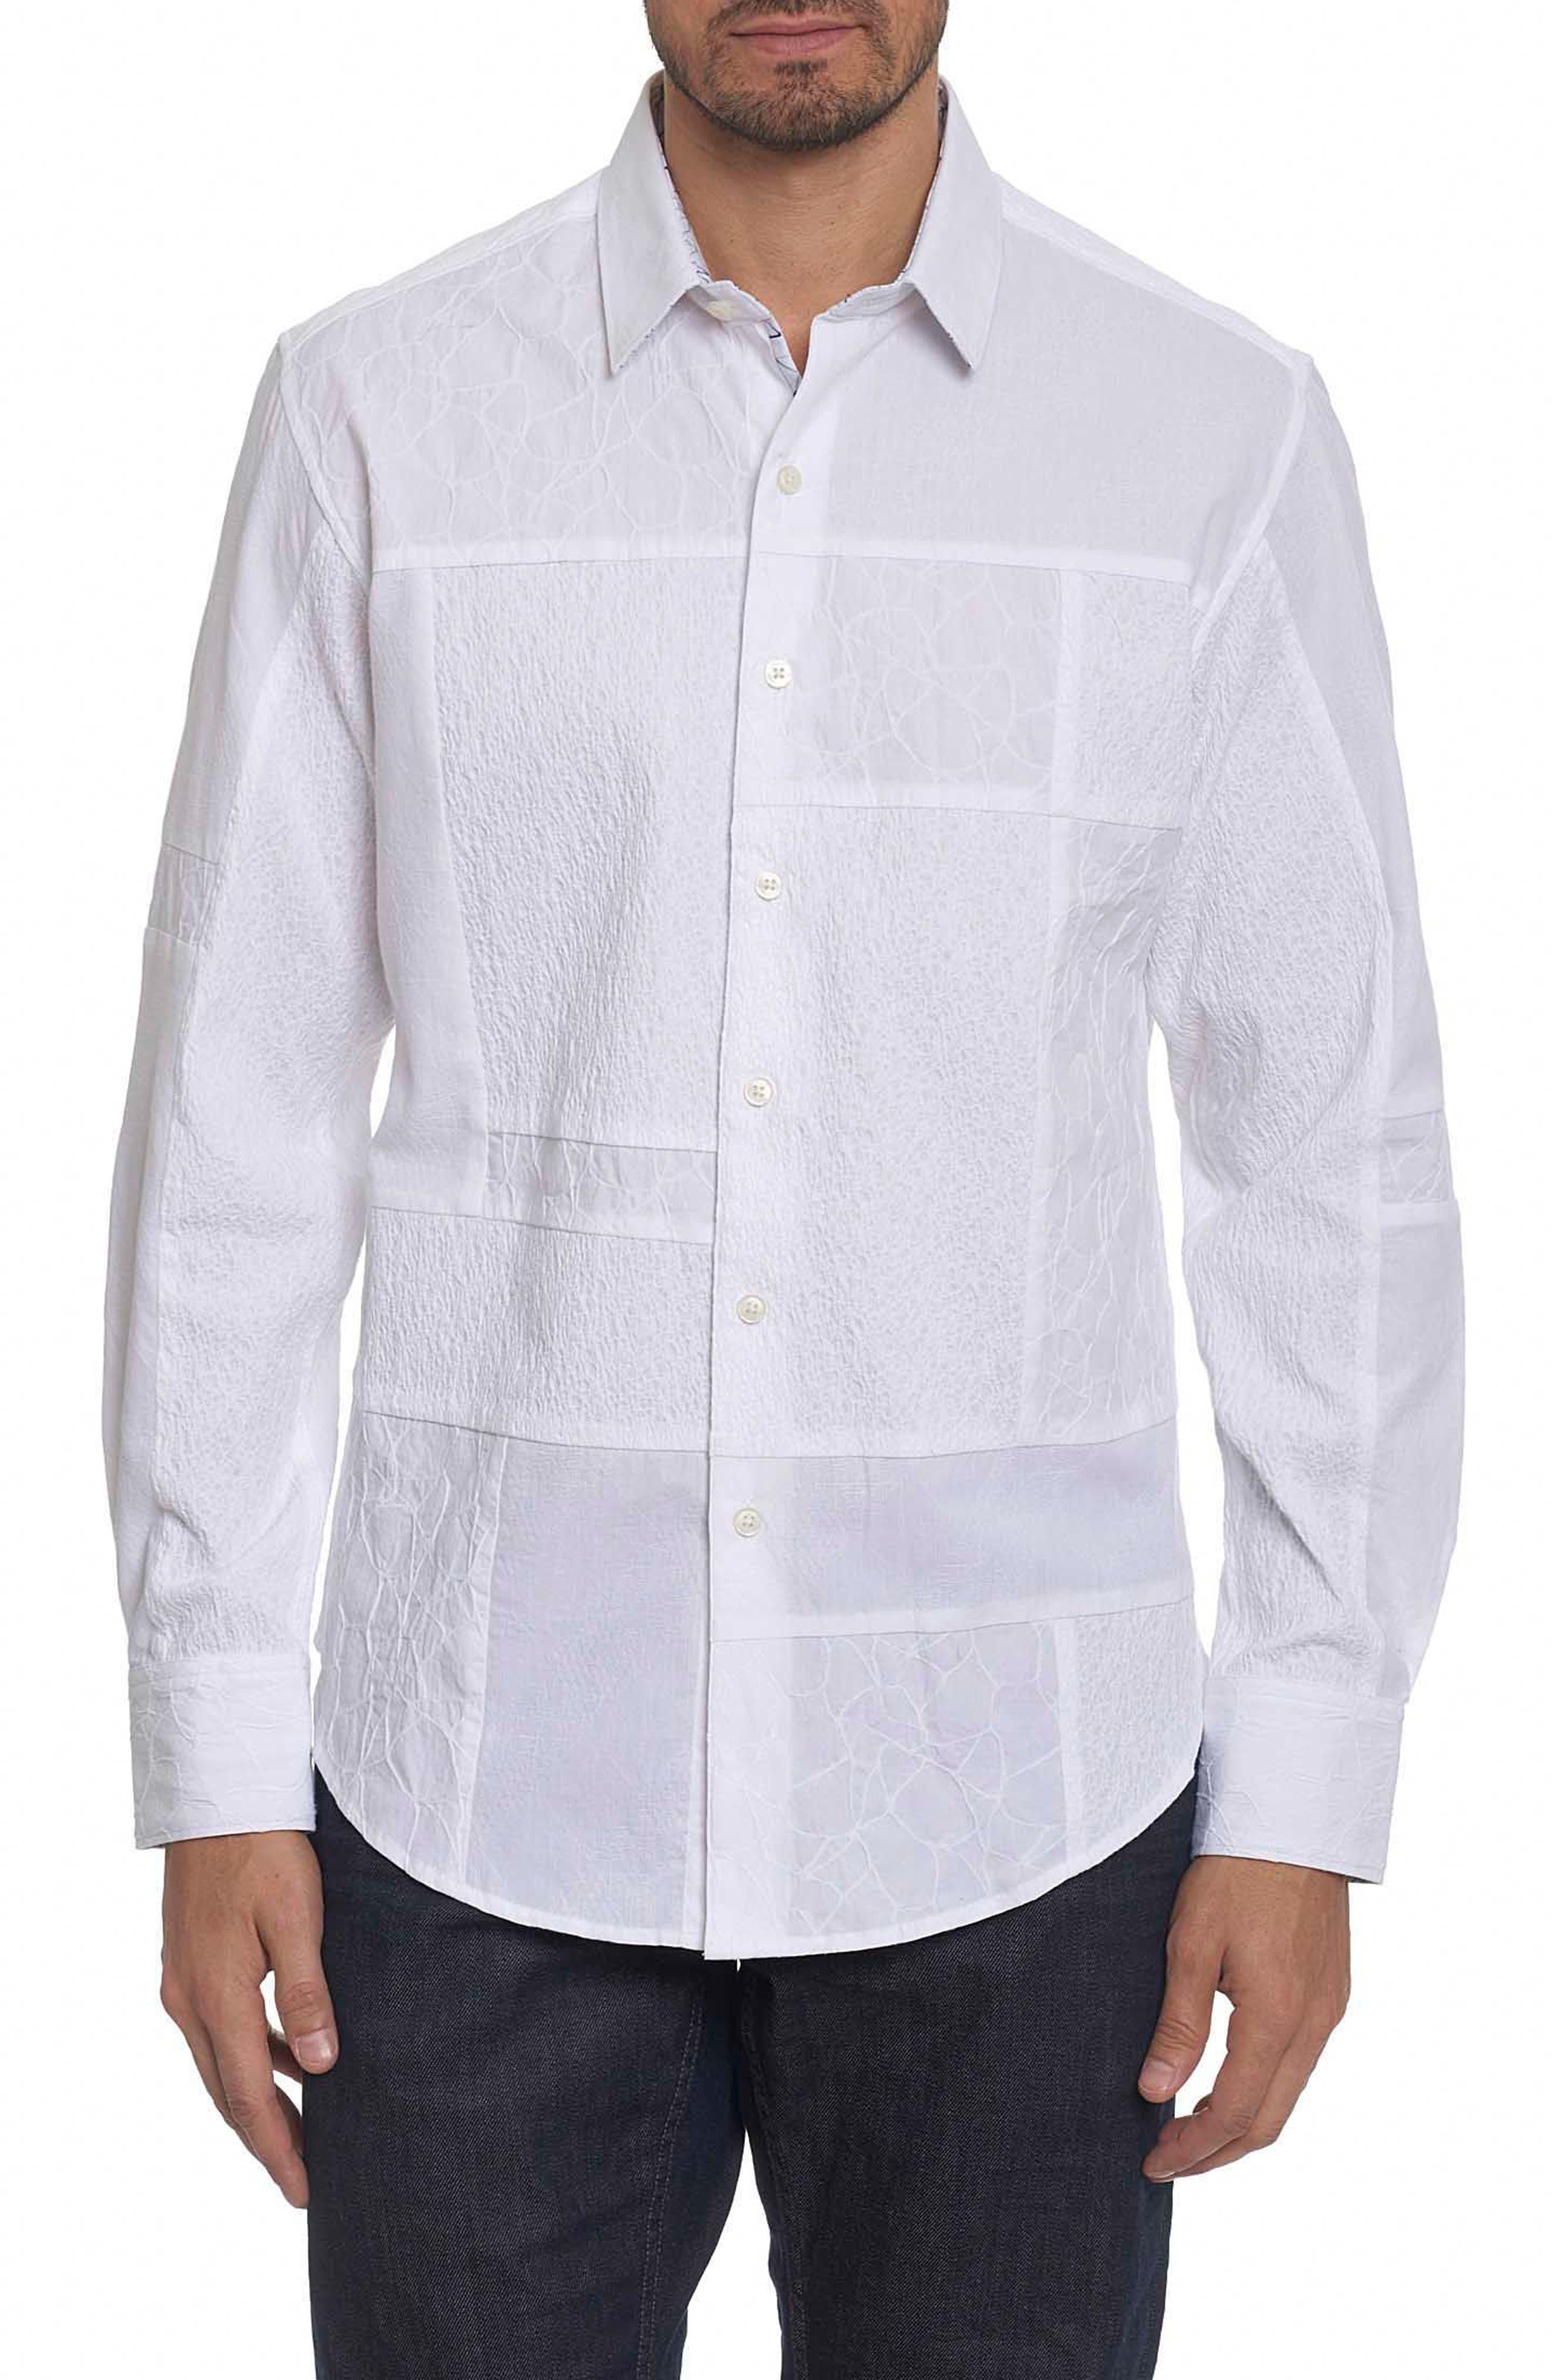 Duke Classic Fit Sport Shirt,                         Main,                         color, White